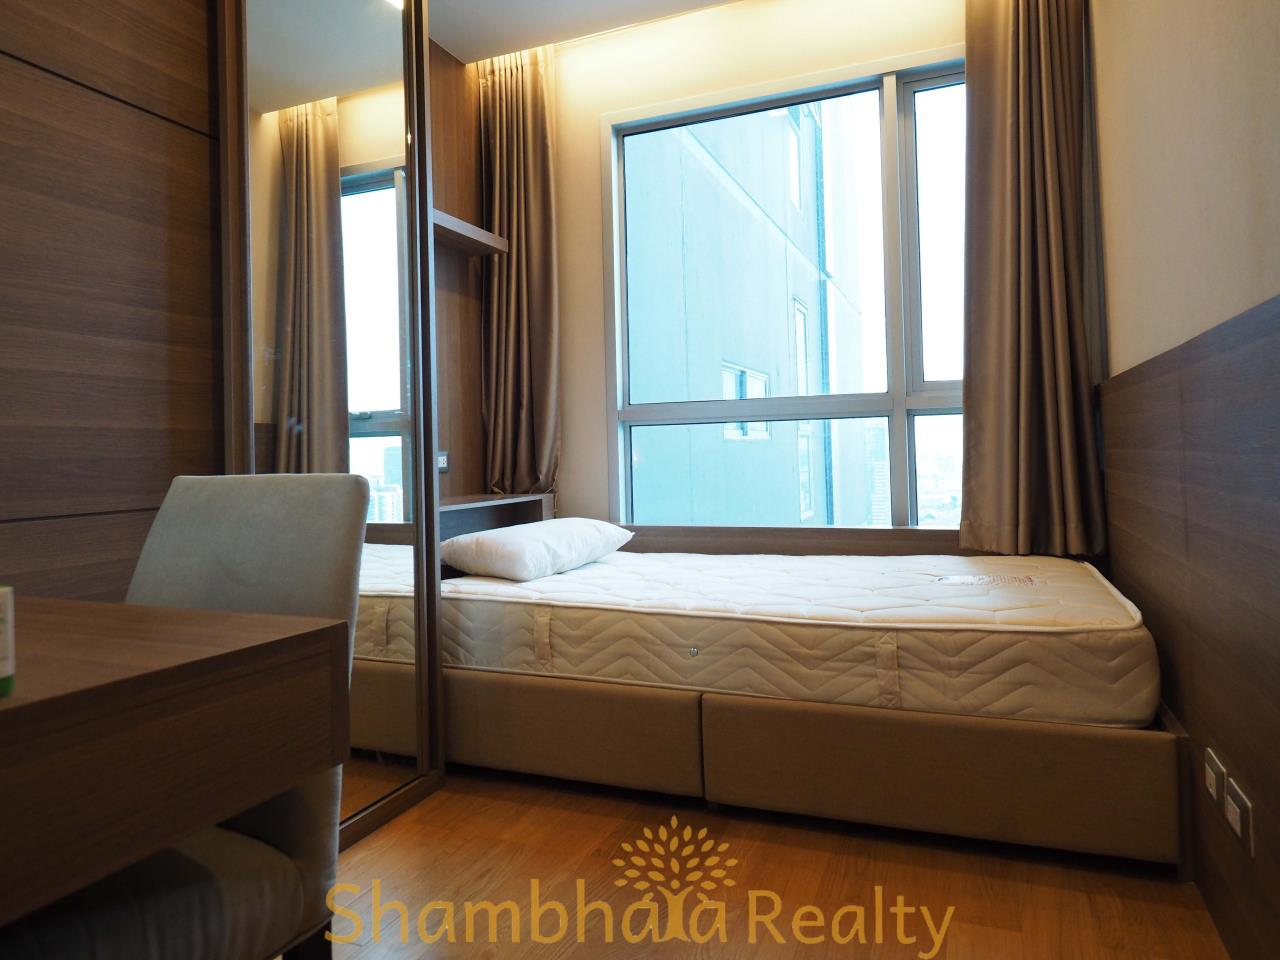 Shambhala Realty Agency's The Address Asoke Condominium for Rent in New Phetchaburi 11